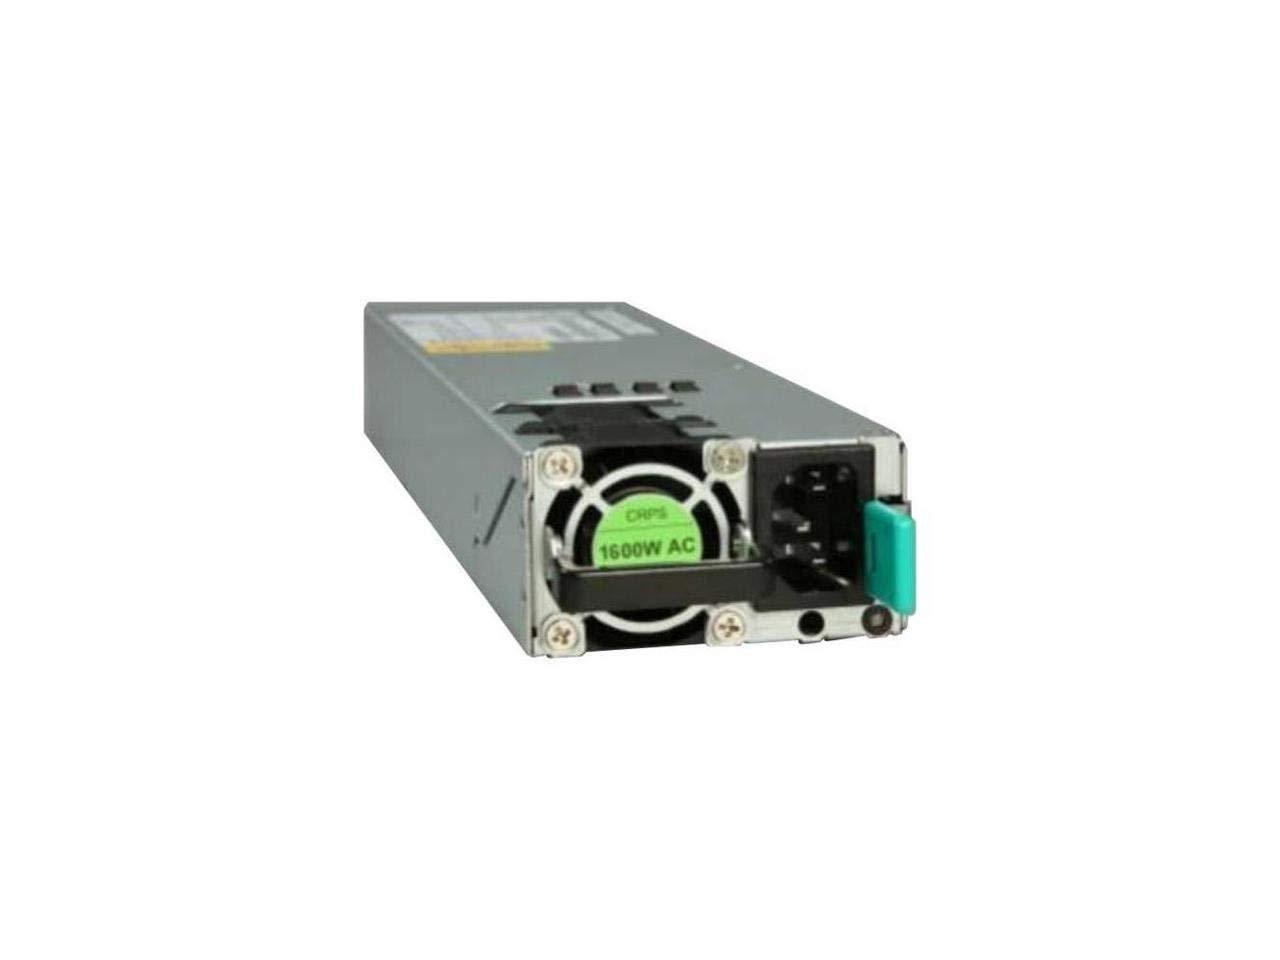 INTEL 1600W AC COMMON REDUNDANT POWER SUPPLY, PLATINUM EFFICIENCY